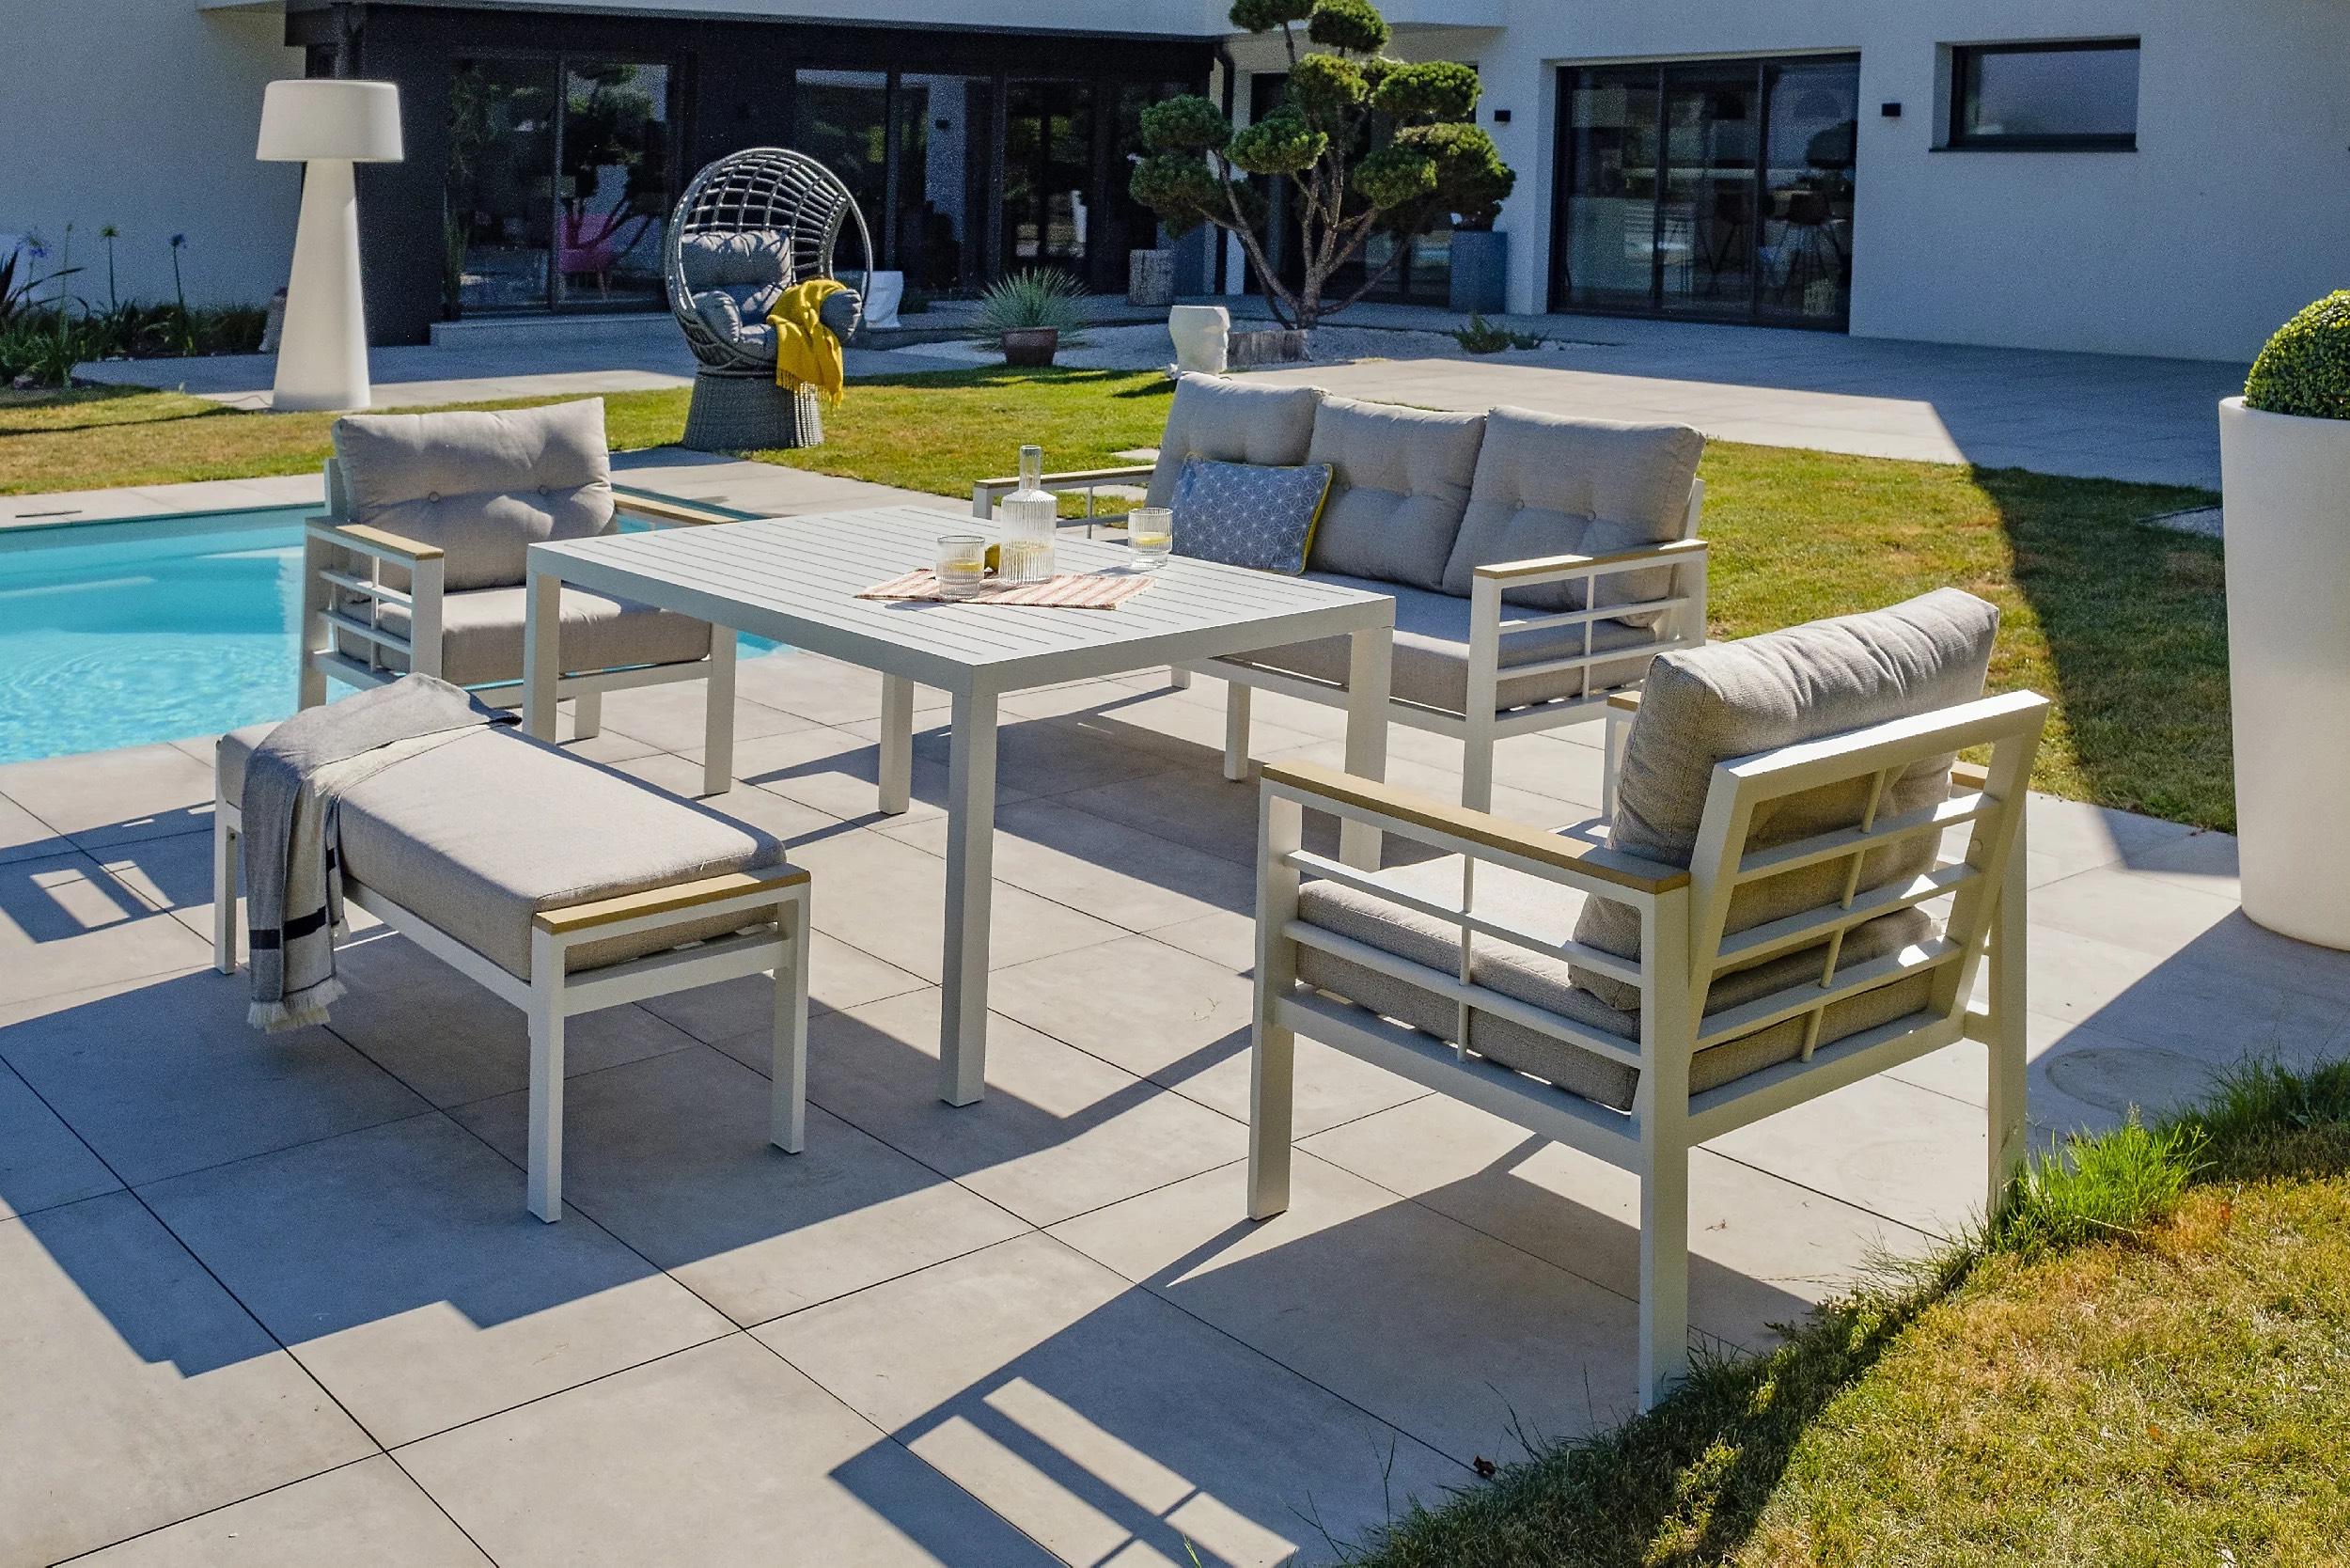 Salon de jardin bas Cayenne DCB Garden - 7 personnes, Aluminium blanc